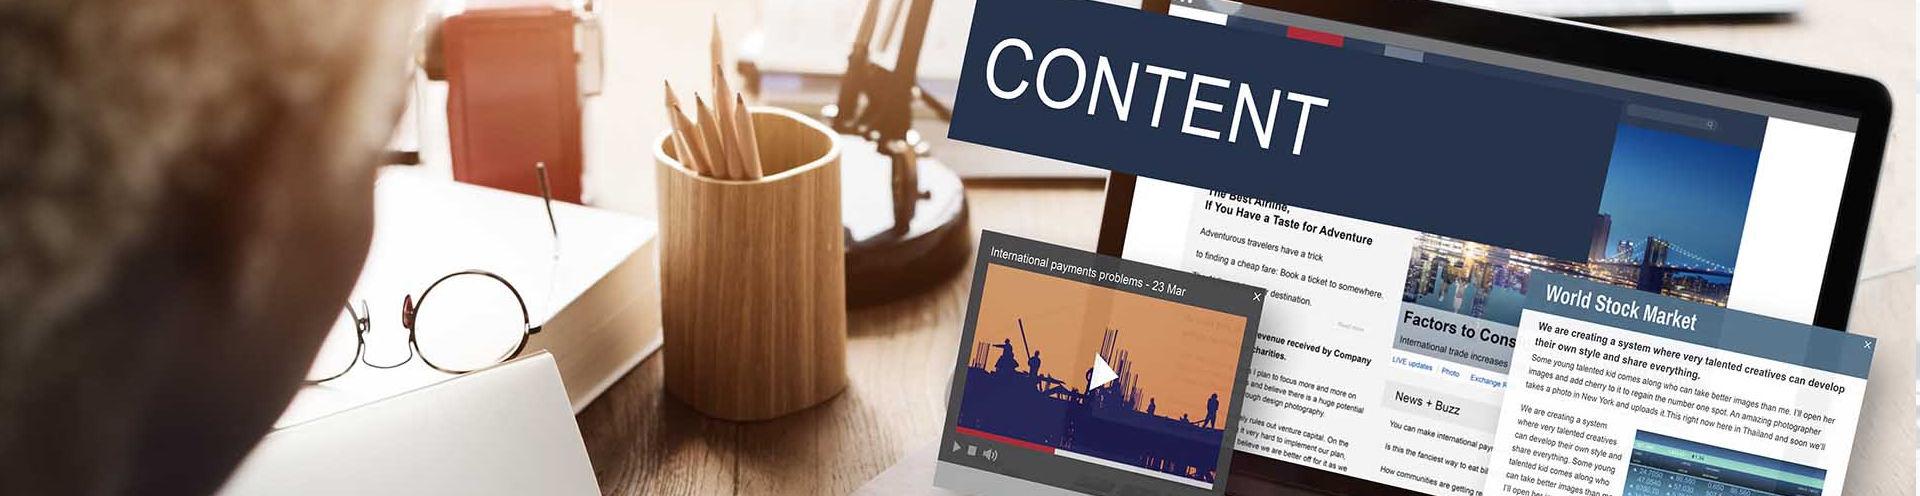 Content Marketing im E-Mail-Marketing